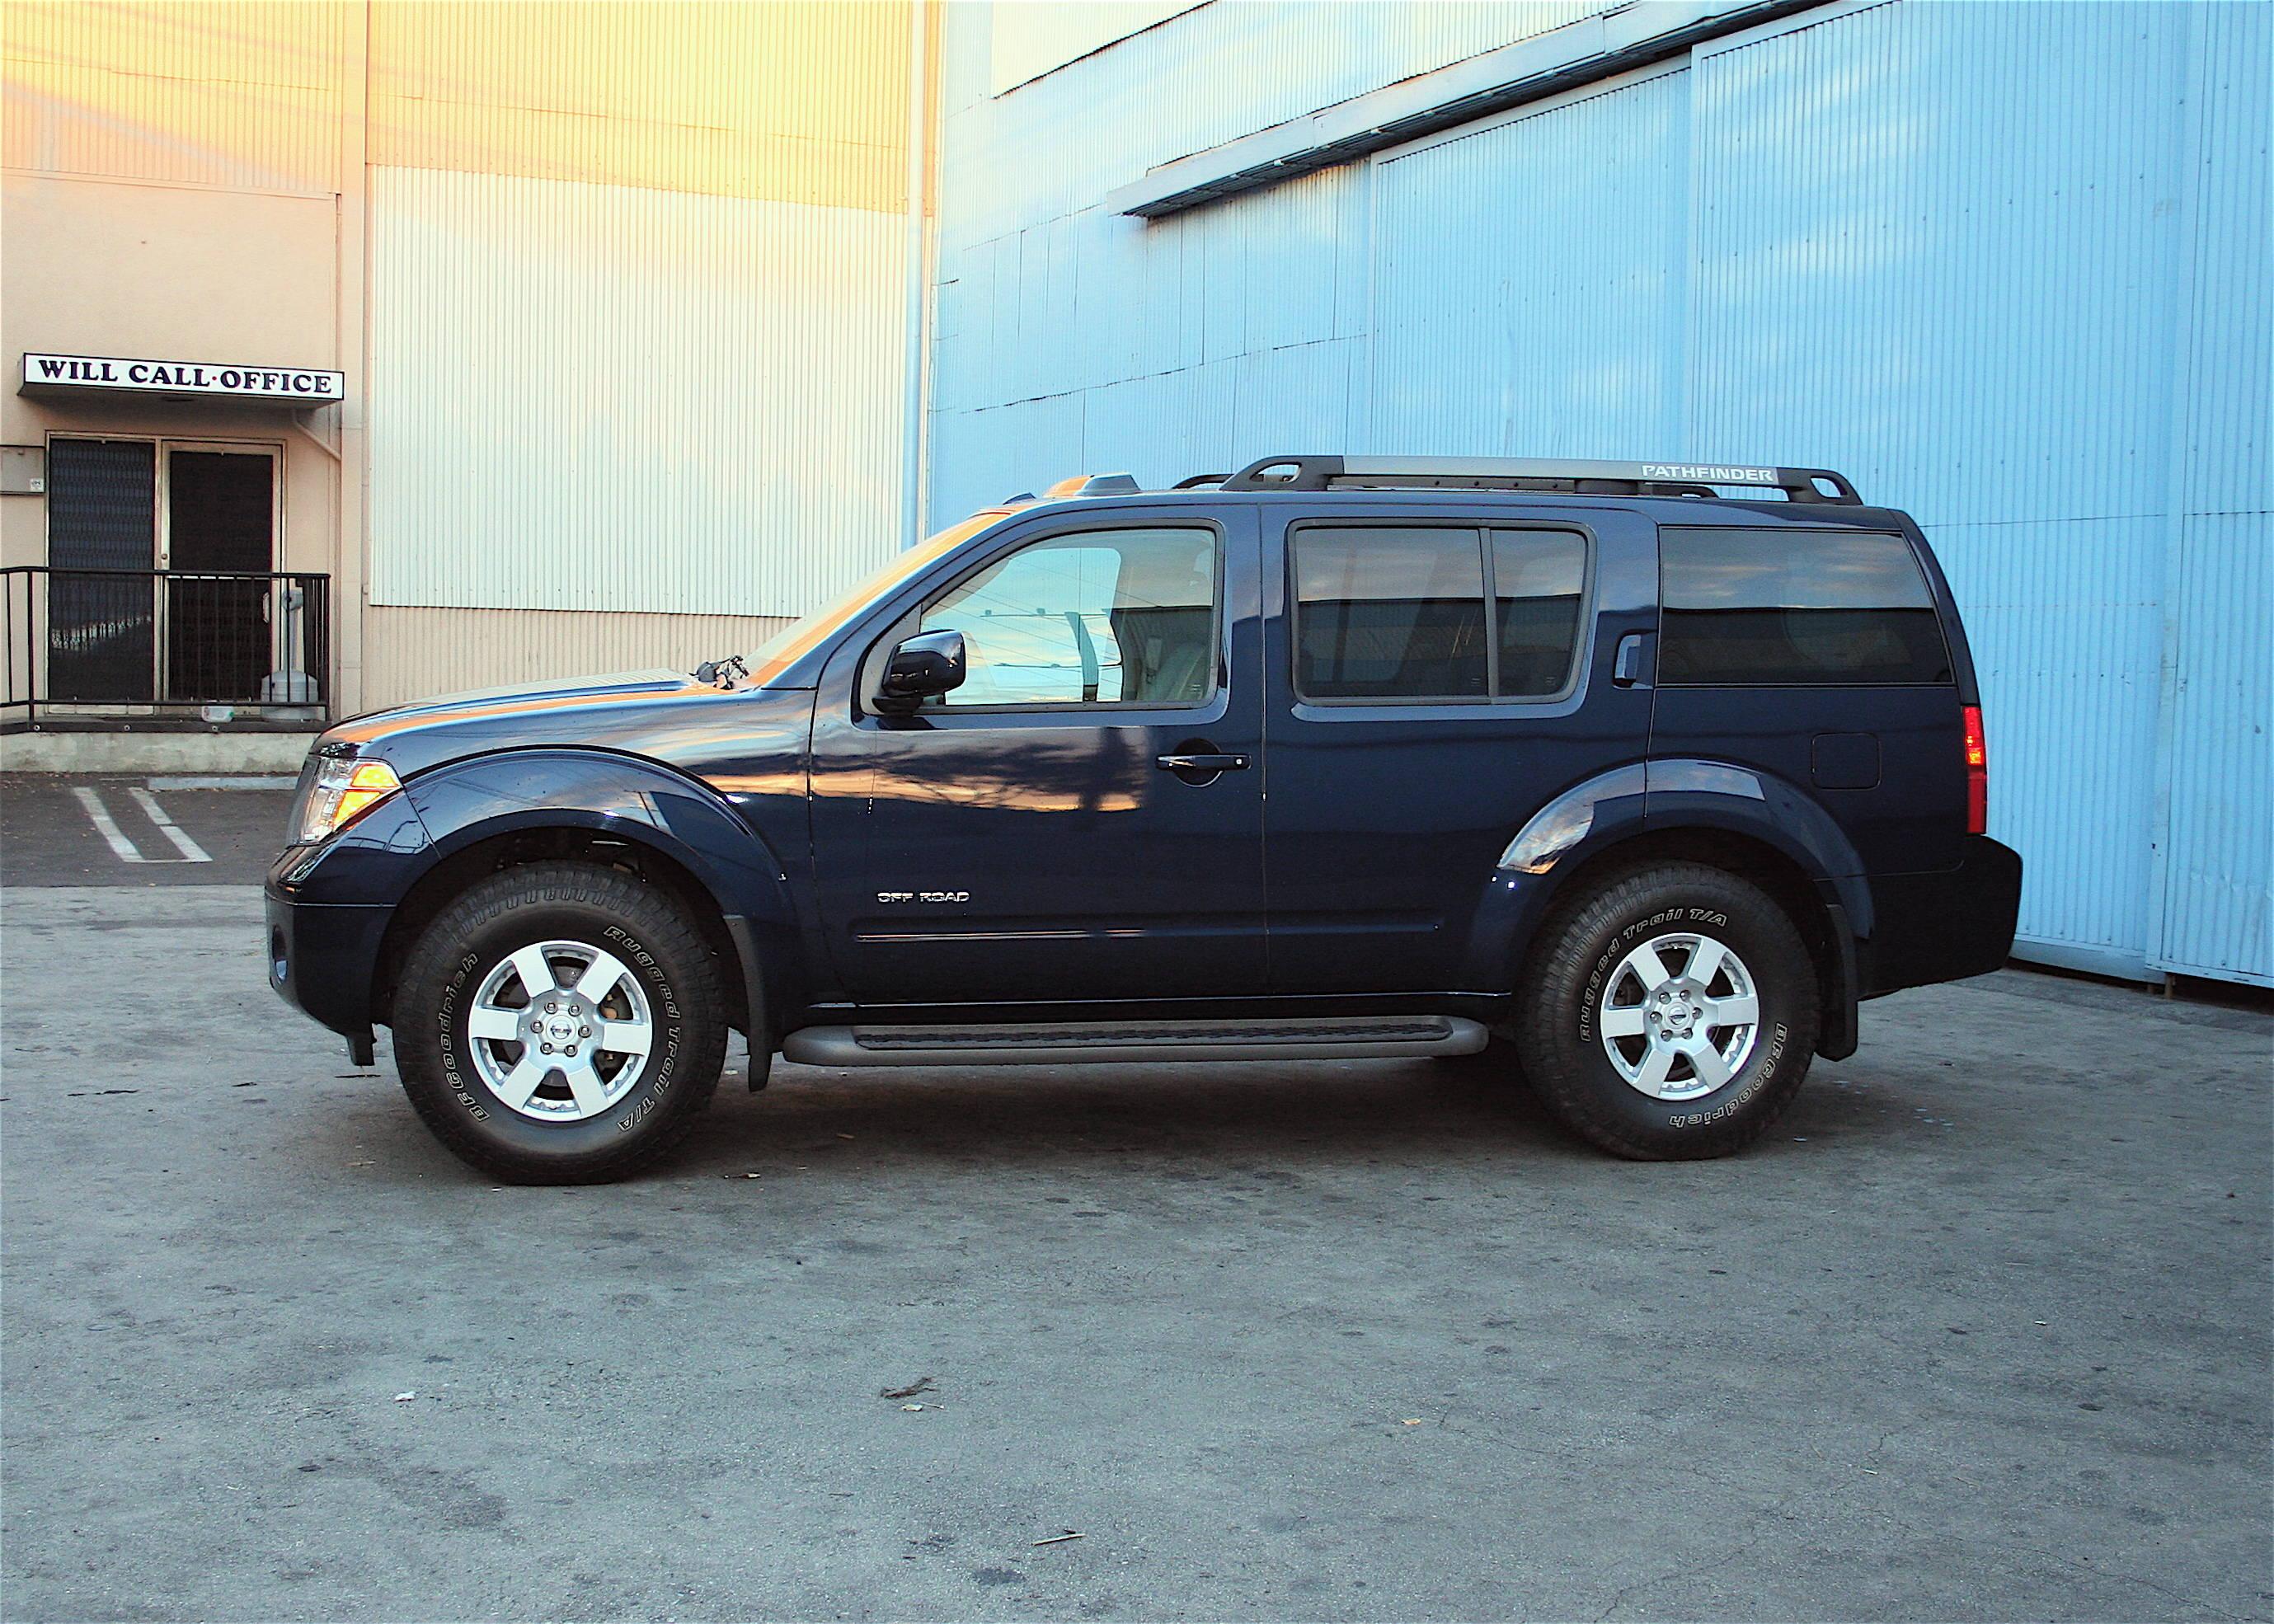 Photos Of Nissan Pathfinder Se Off Road Photo Car Nissan Pathfinder Se Off Road 02 Jpg Gr8autophoto Com